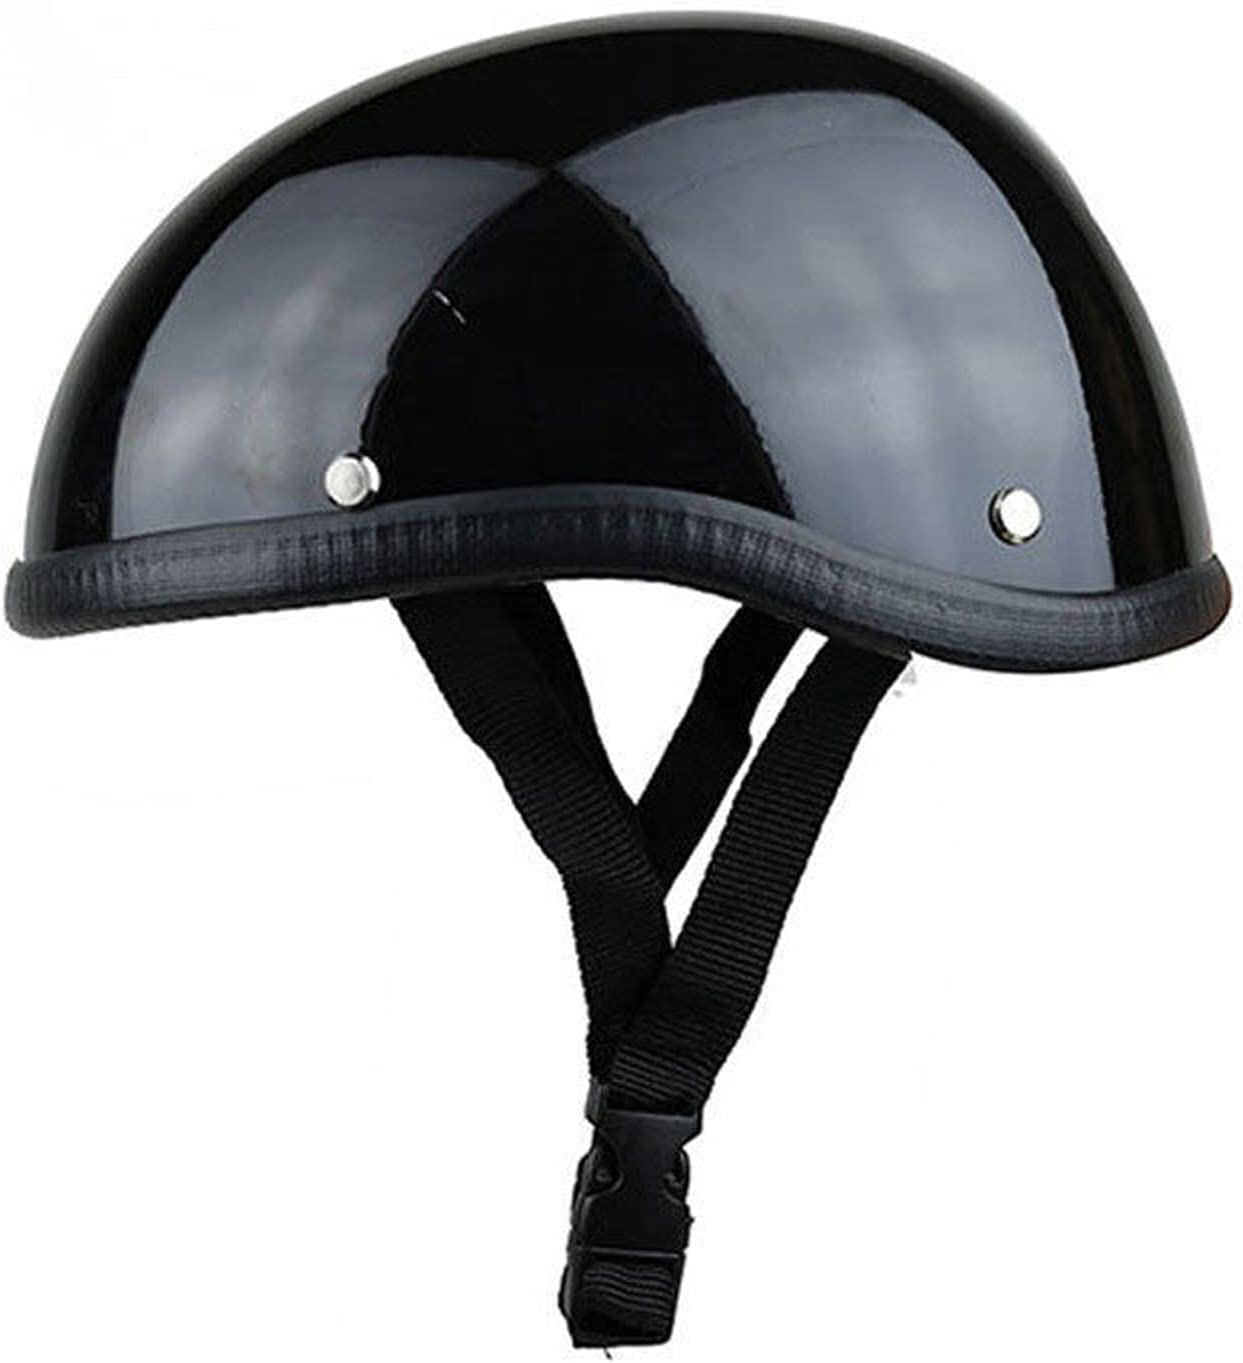 ZHEN Retro Novelty Motorcycle Skull Ultra-Thin Adult Cap Super beauty product New life restock quality top Helmet